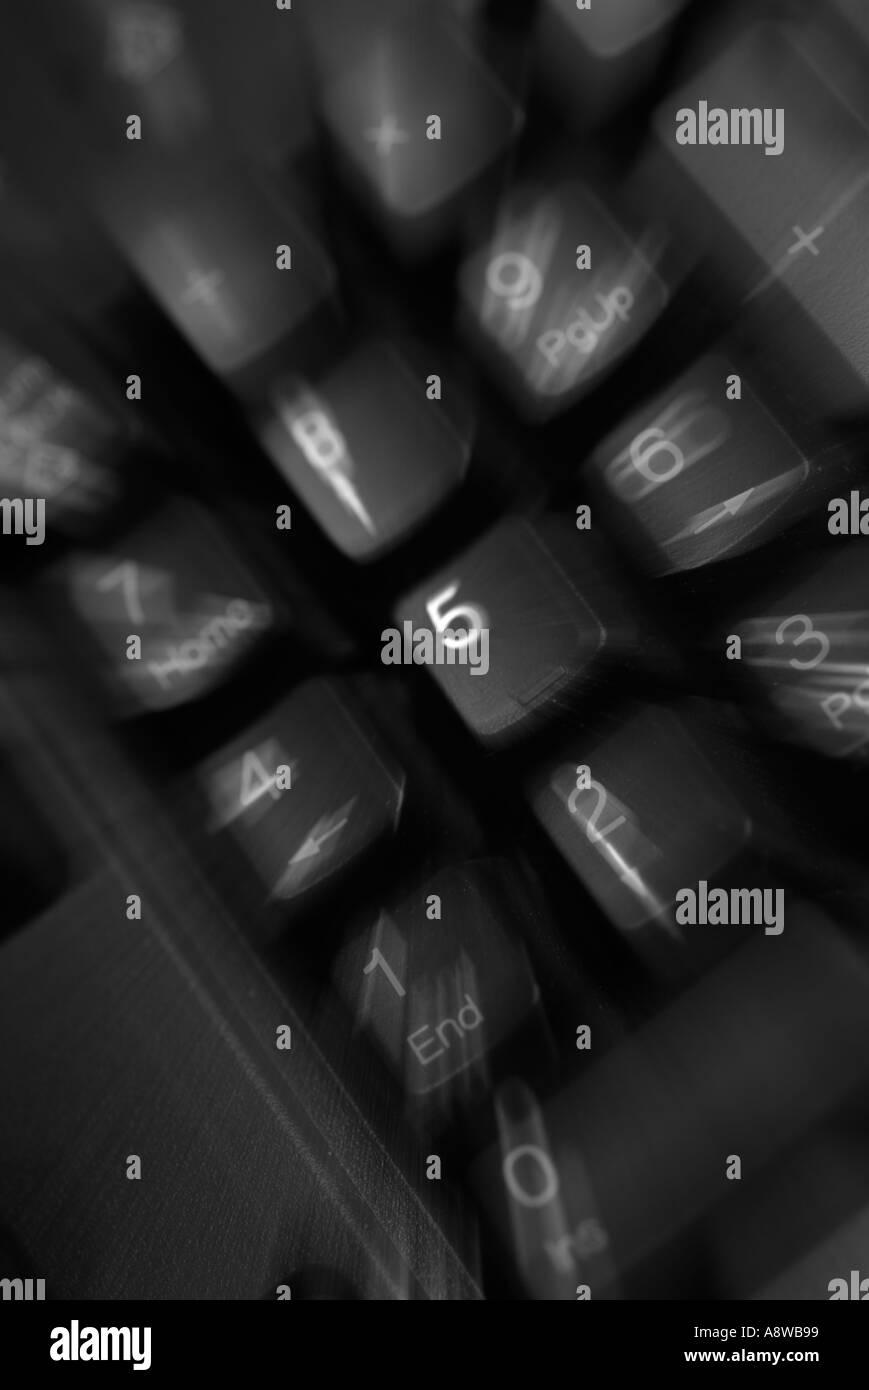 data input computer internet keyboard qwerty numerical frustration escape esc lock up shutdown crash - Stock Image